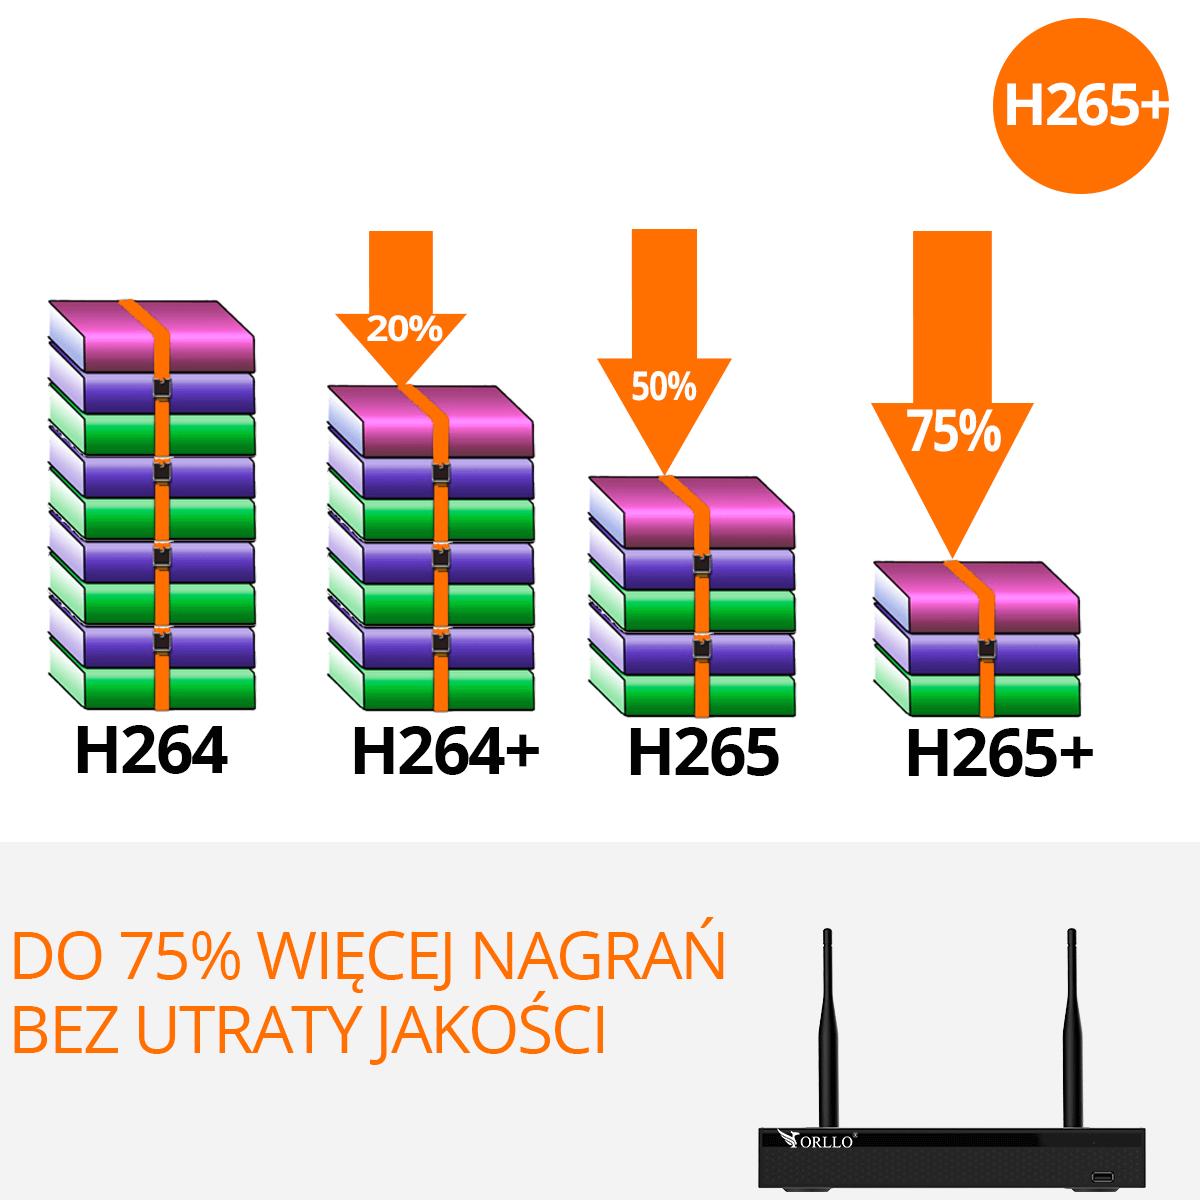 Zestaw-do-monitoringu-camset-kompresja-orllo-pl